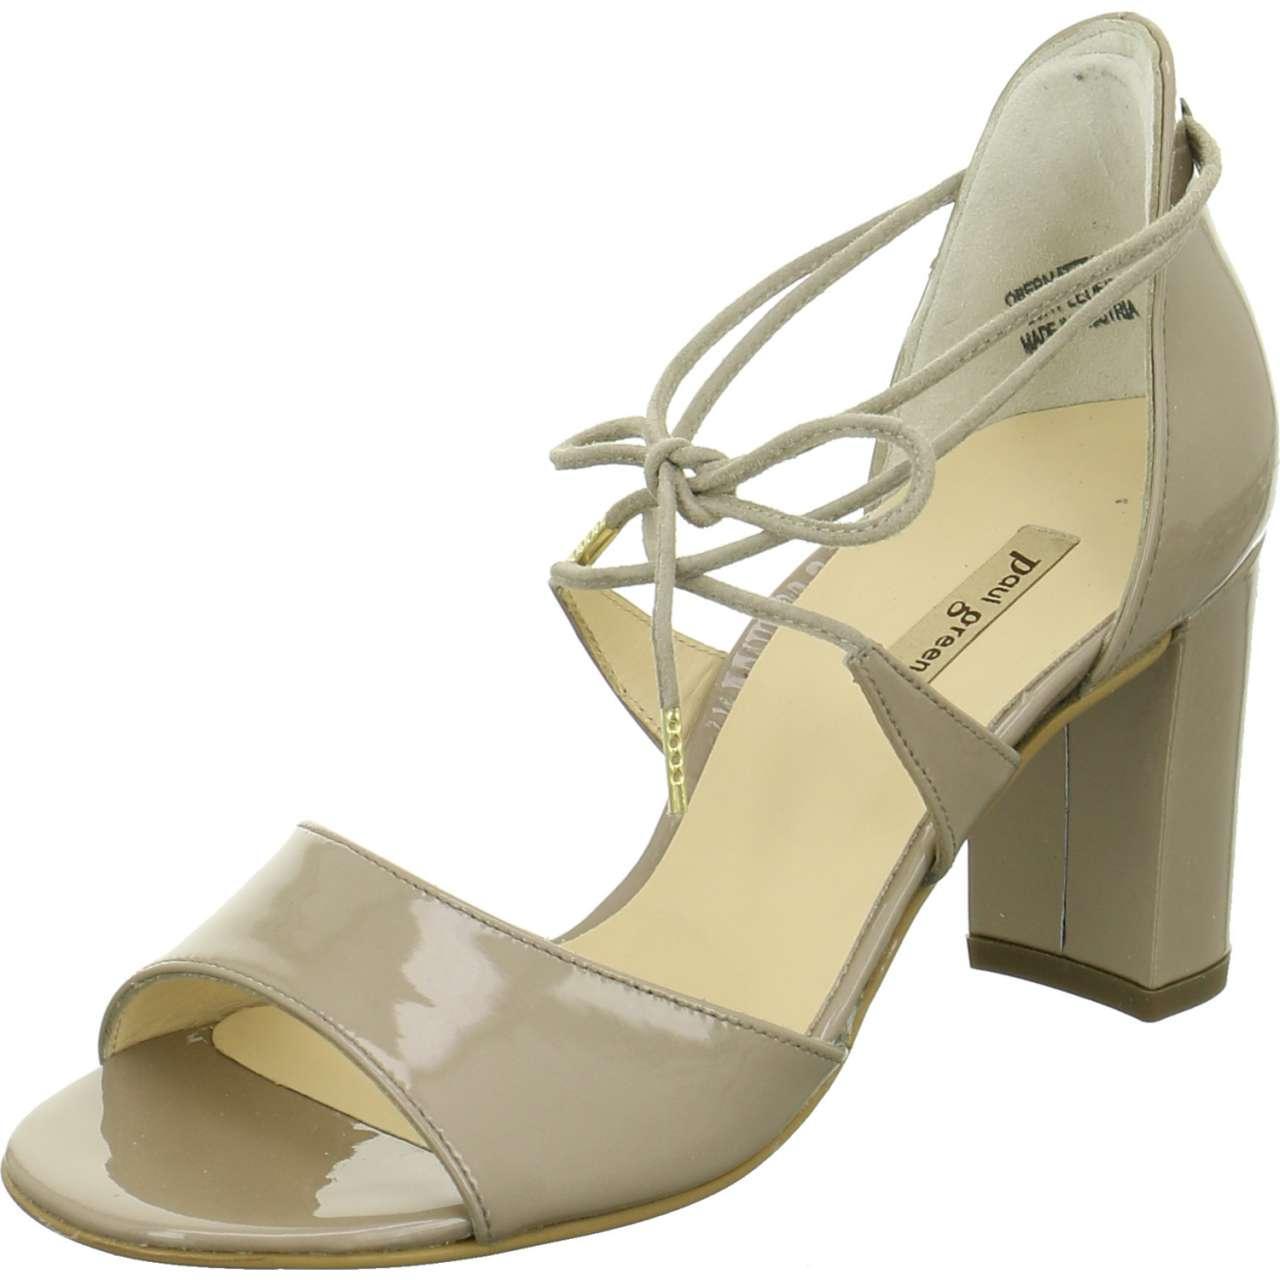 53c16fb5ccf Paul Green - Wo Strap Sandals Grey Taupe Softlack Metallic - Lyst. View  fullscreen